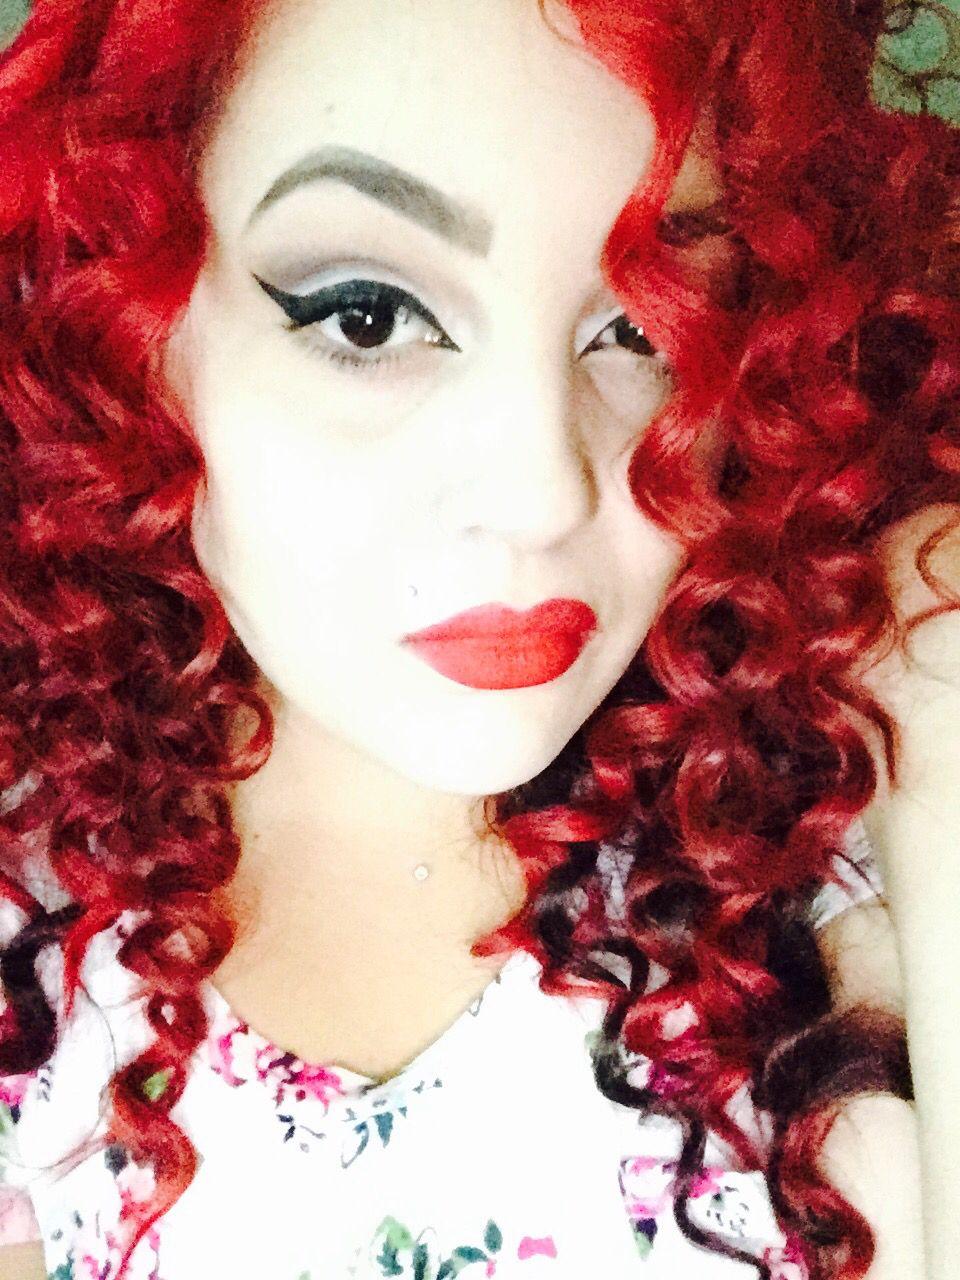 Ten Clarifications On Does Splat Hair Dye Damage Your Hair Splat Hair Dye Hair Dye Tips Dyed Hair